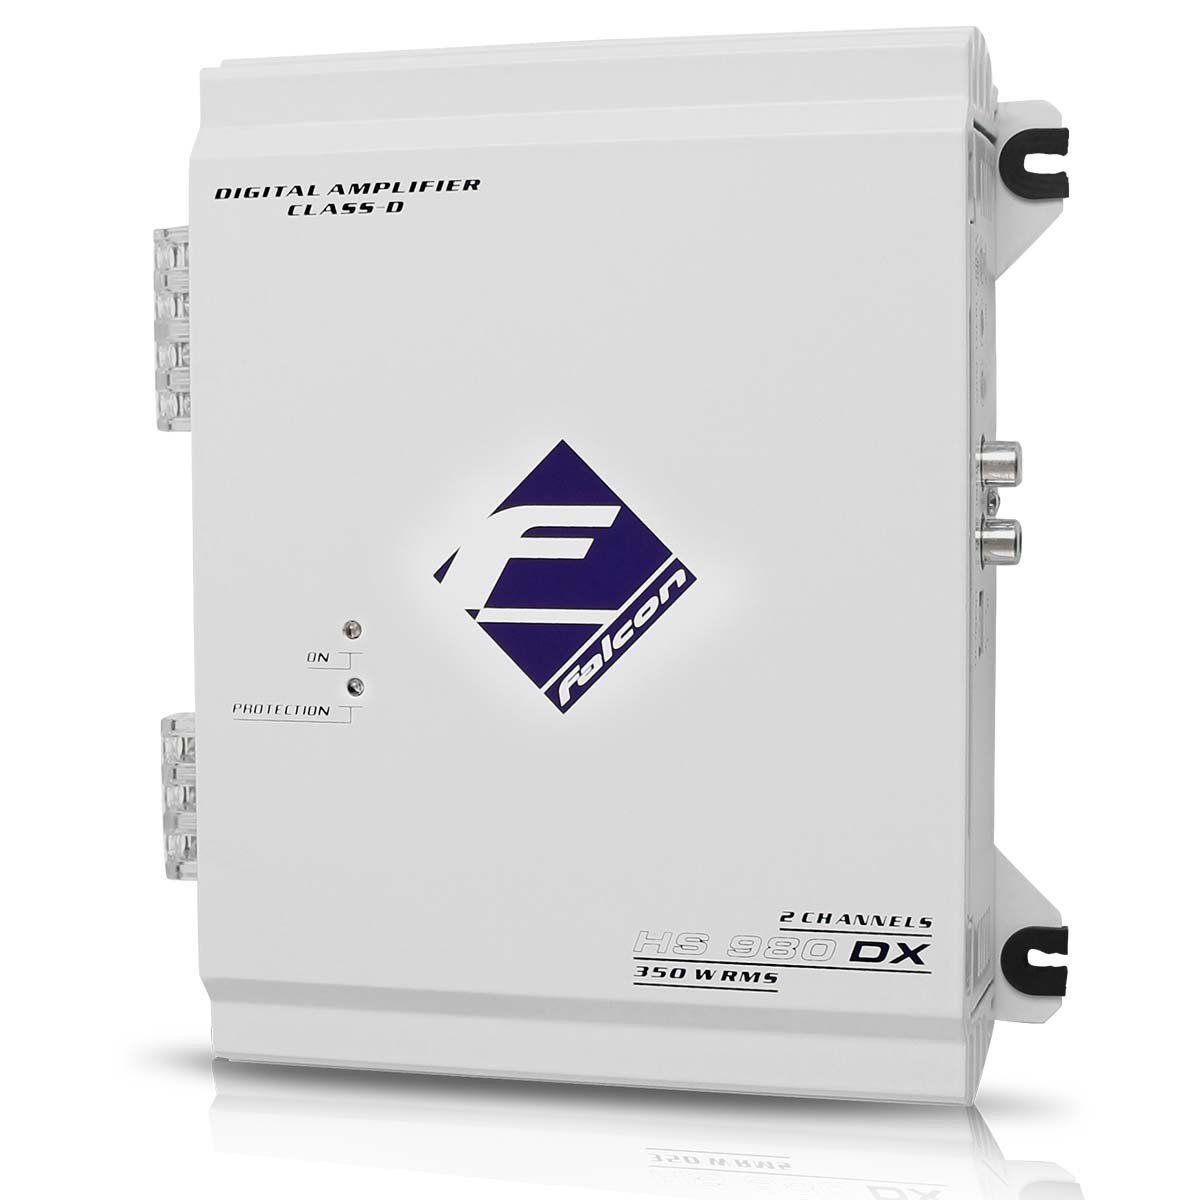 Módulo Amplificador Falcon Hs980 Dx Digital 320w Rms 2 Can